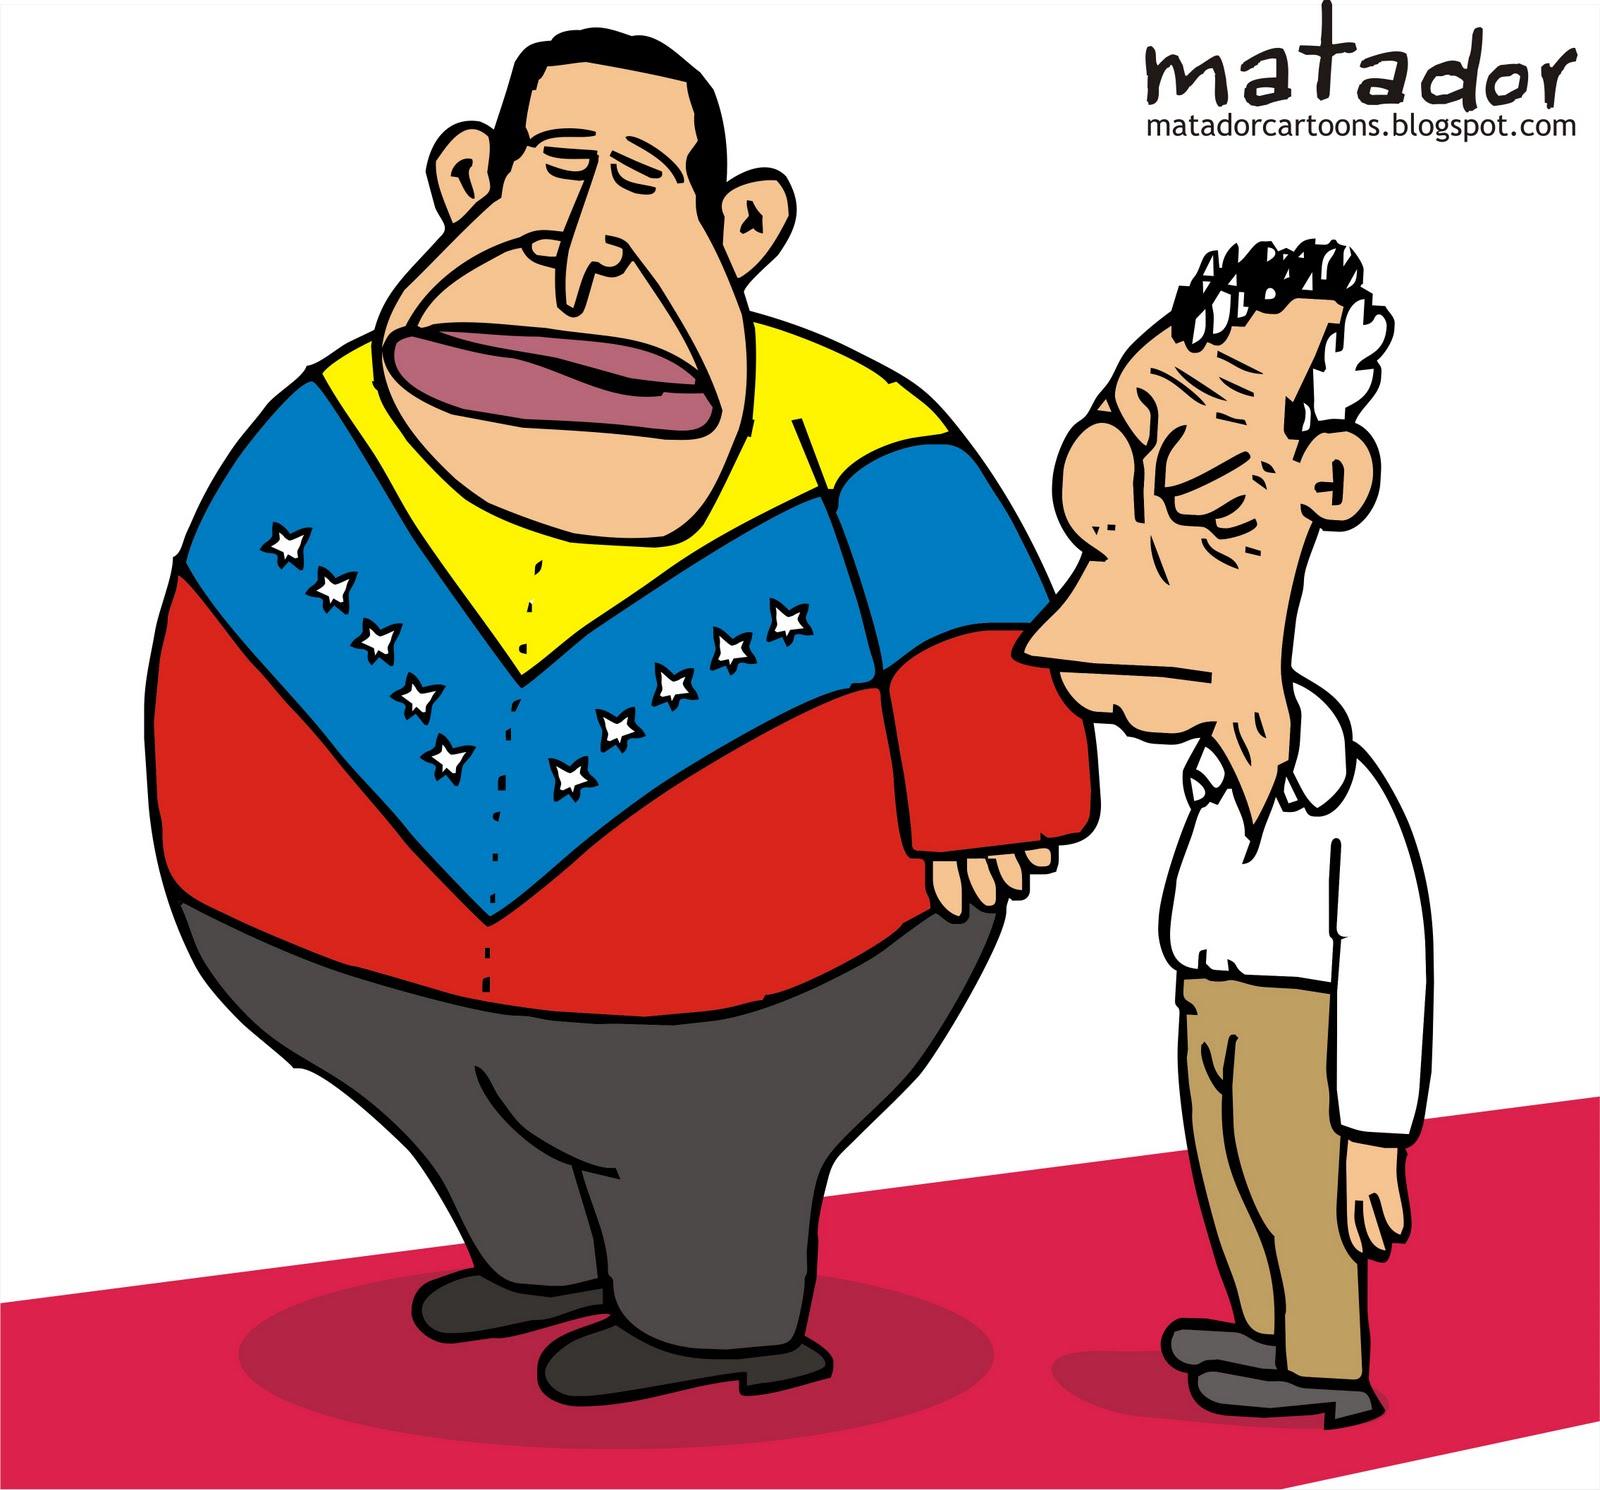 Fotos caricaturas gordos - Imagui